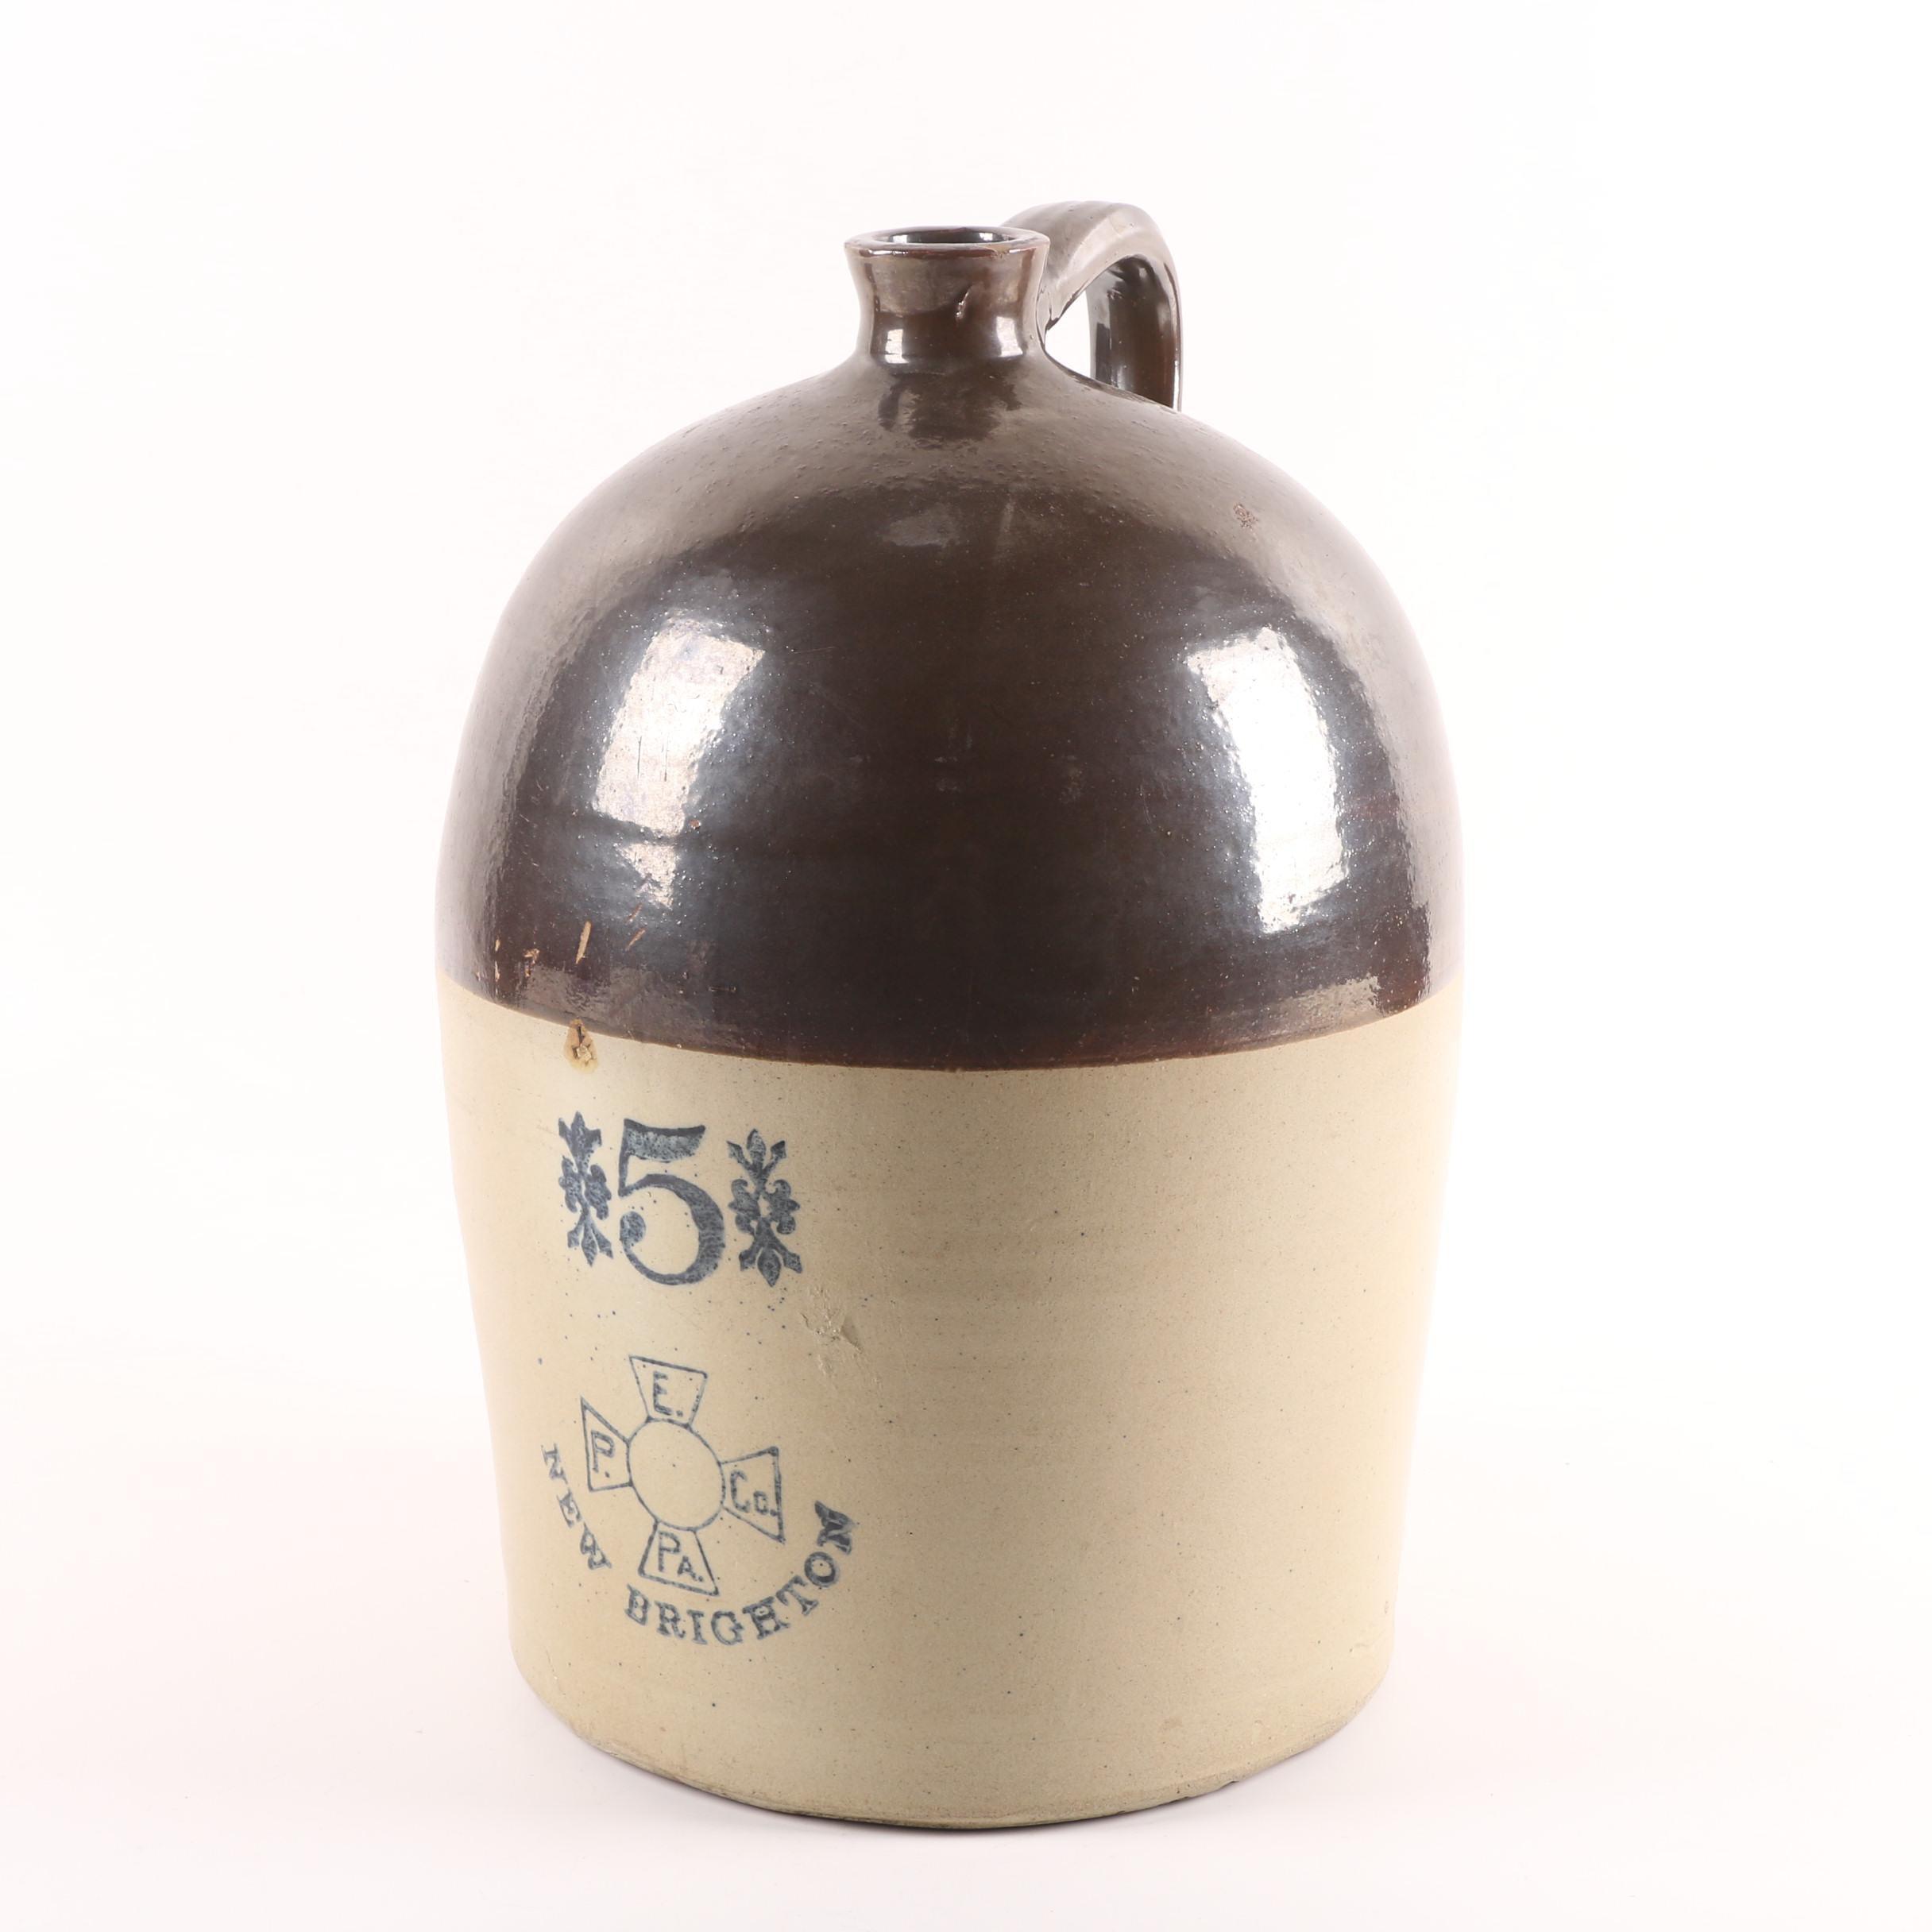 Vintage Enterprise Pottery Stoneware Jug